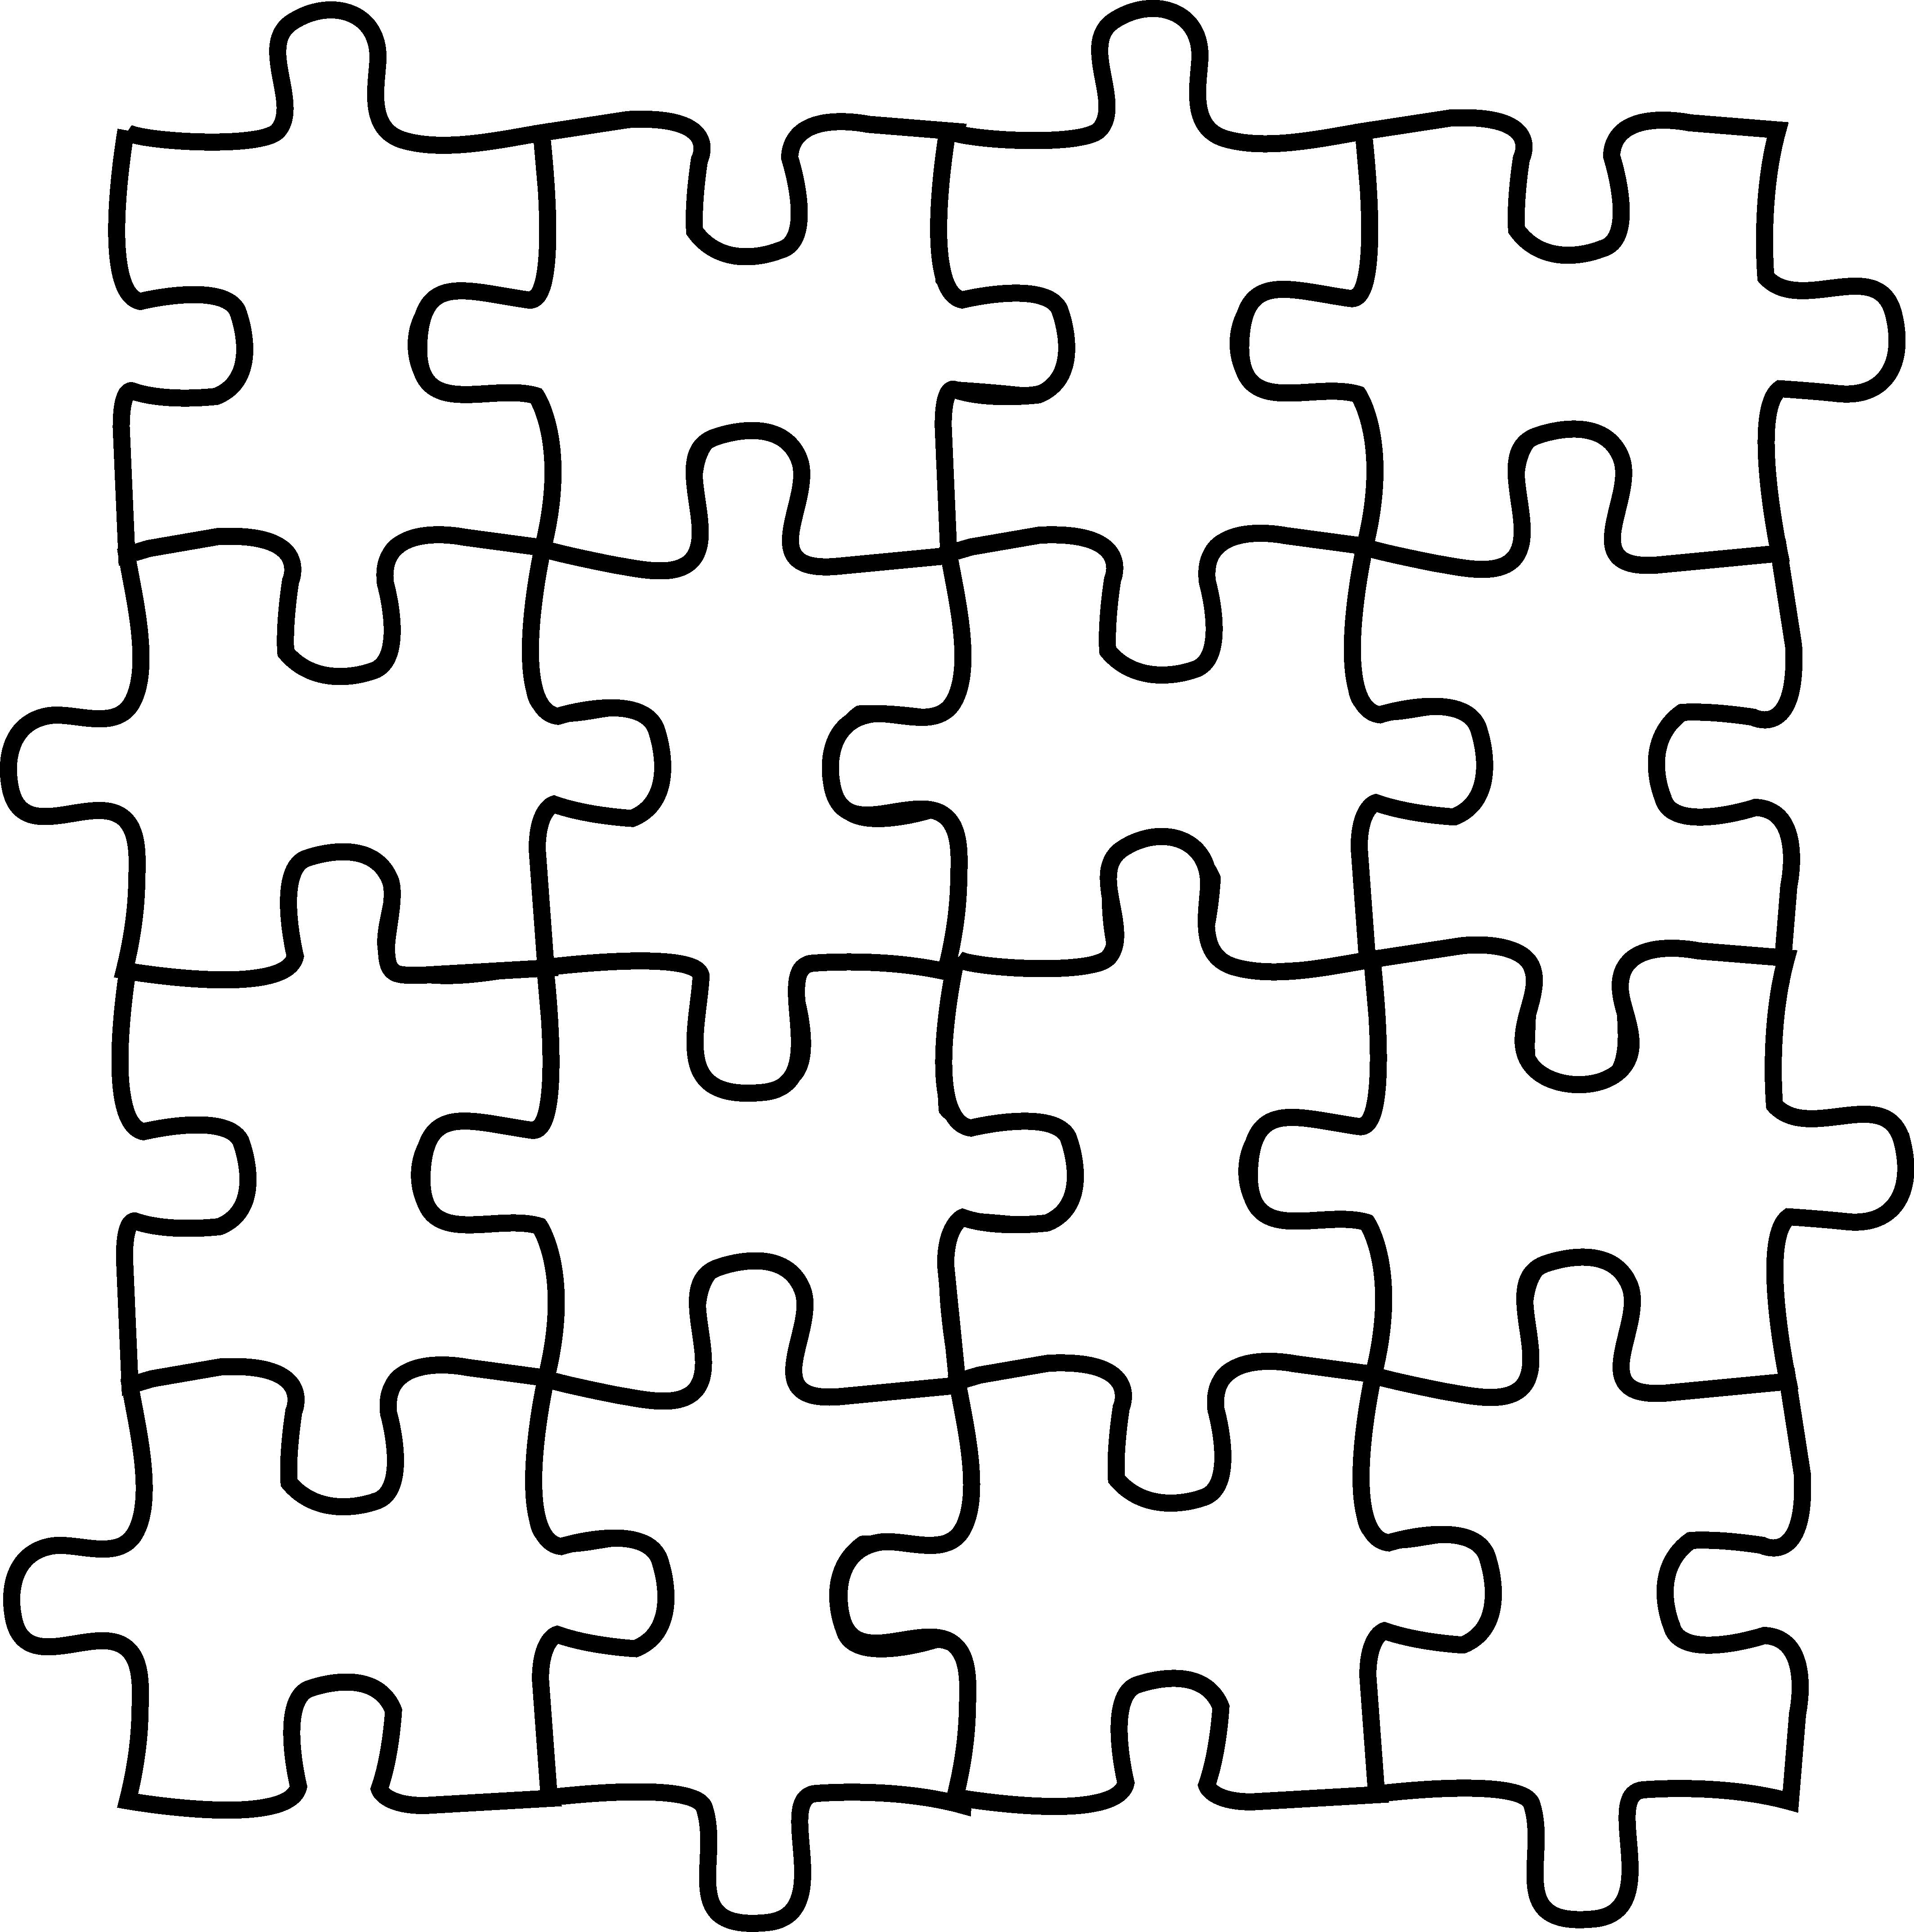 4254x4293 Puzzle Pieces Coloring Page